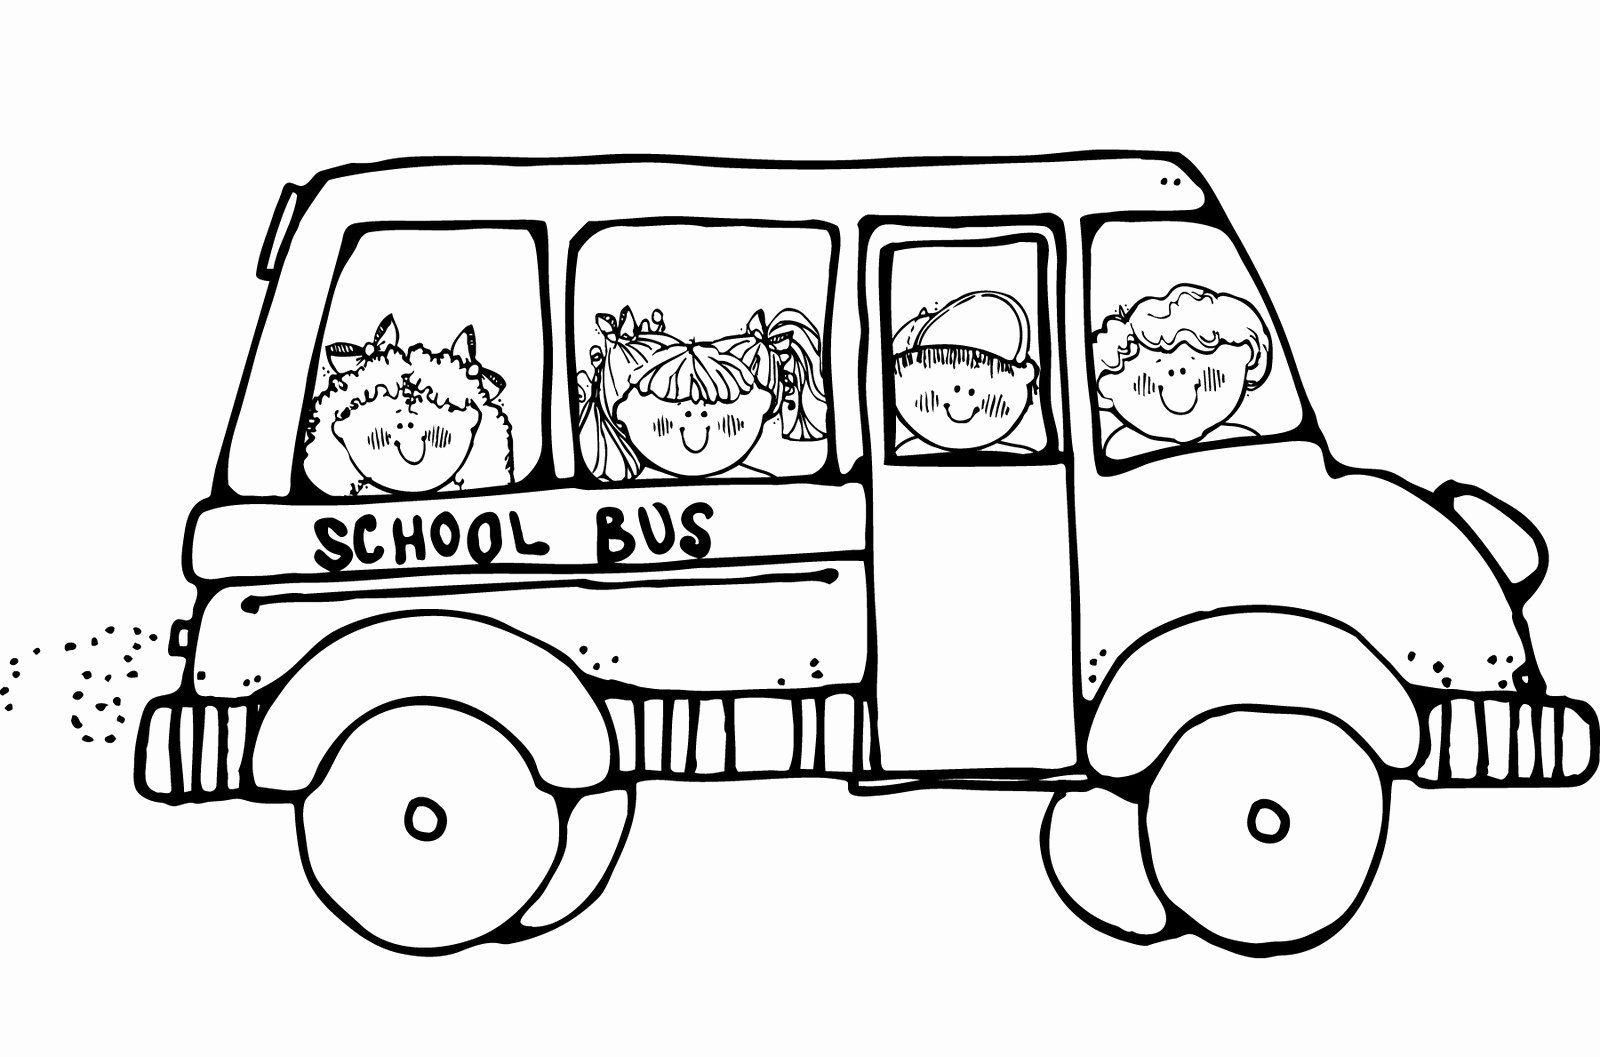 School Bus Coloring Page Beautiful Free Printable School